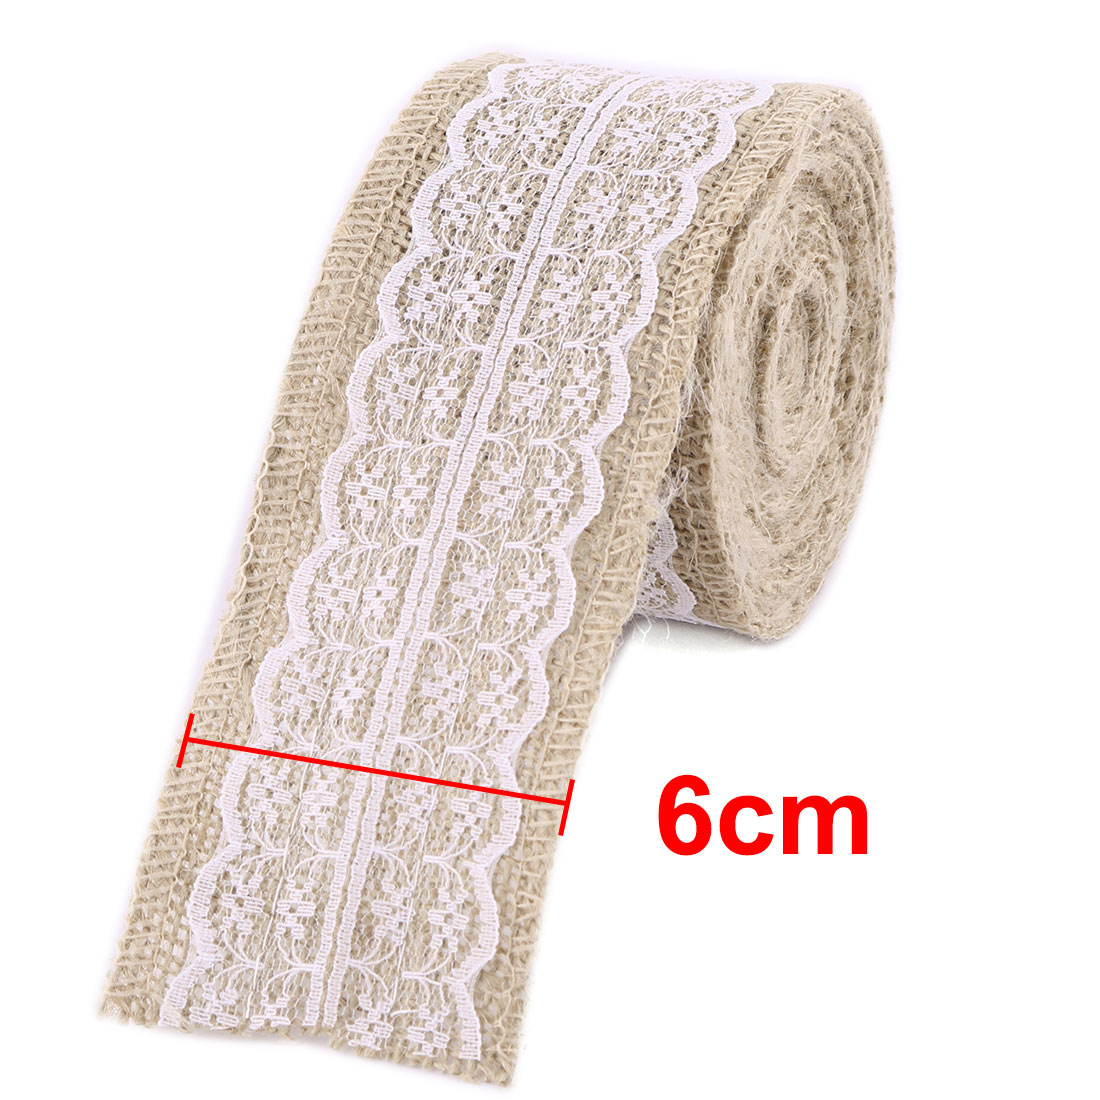 Wedding Burlap Handcraft Gift Packing Belt Ribbon Roll Decor White 4.4 Yards - image 3 of 5